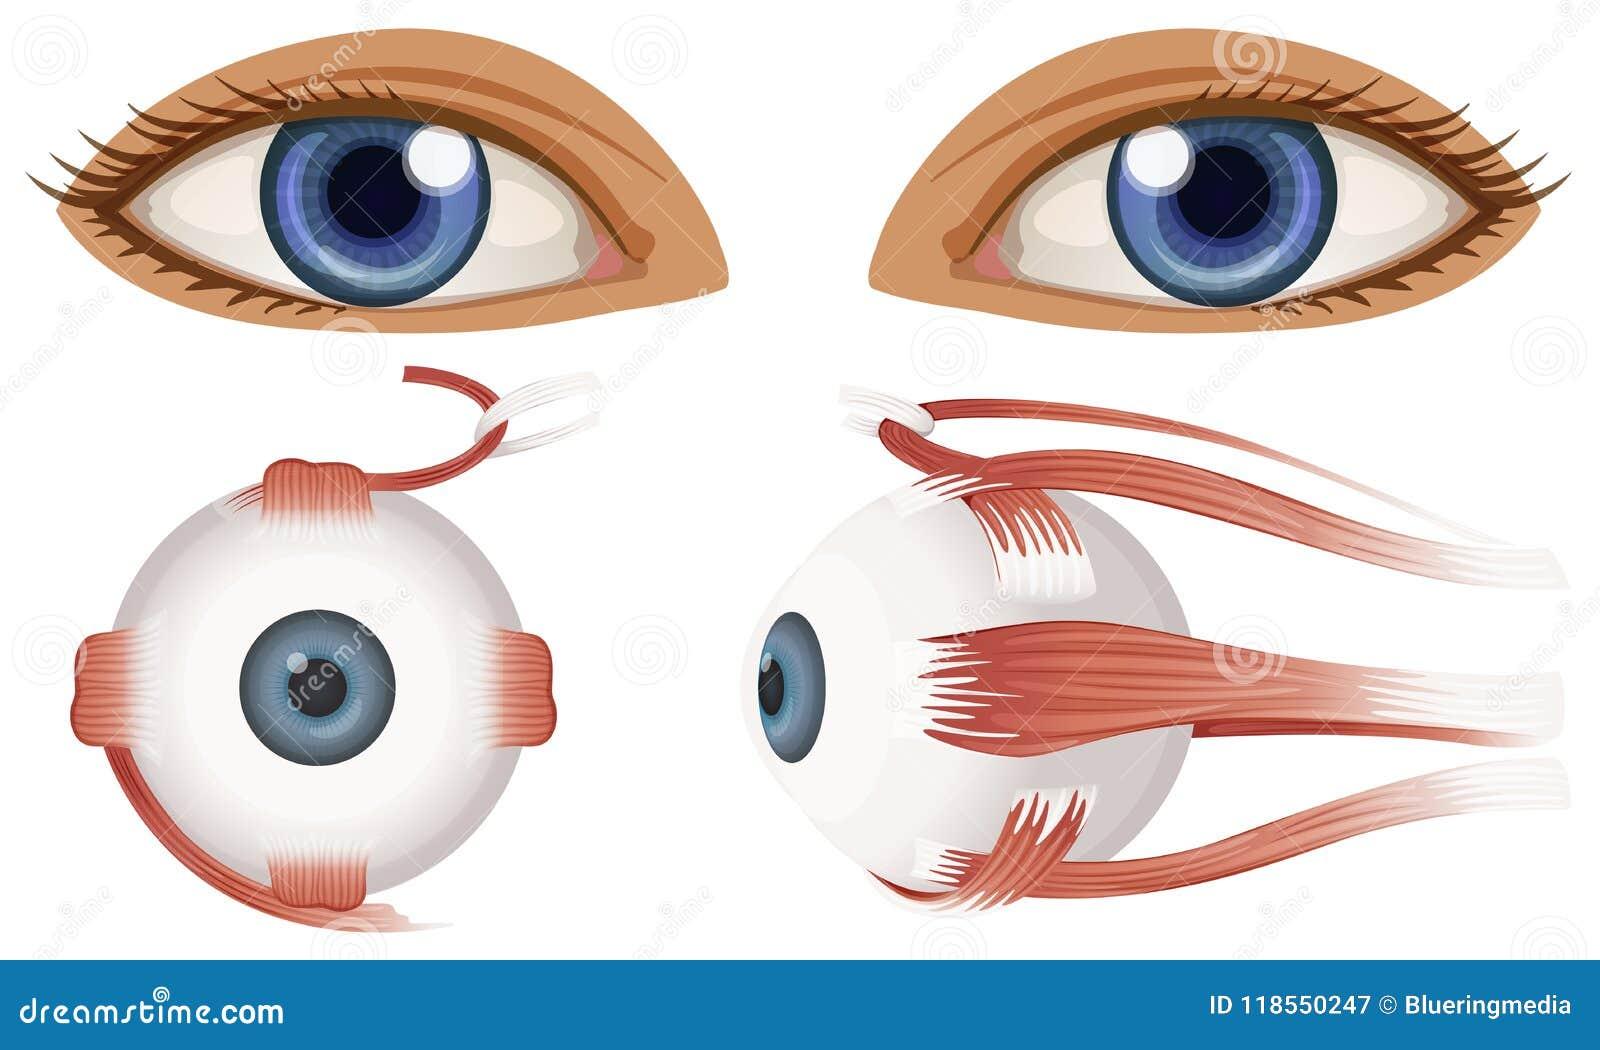 Human Anatomy Of Eyeball Stock Vector Illustration Of Black 118550247